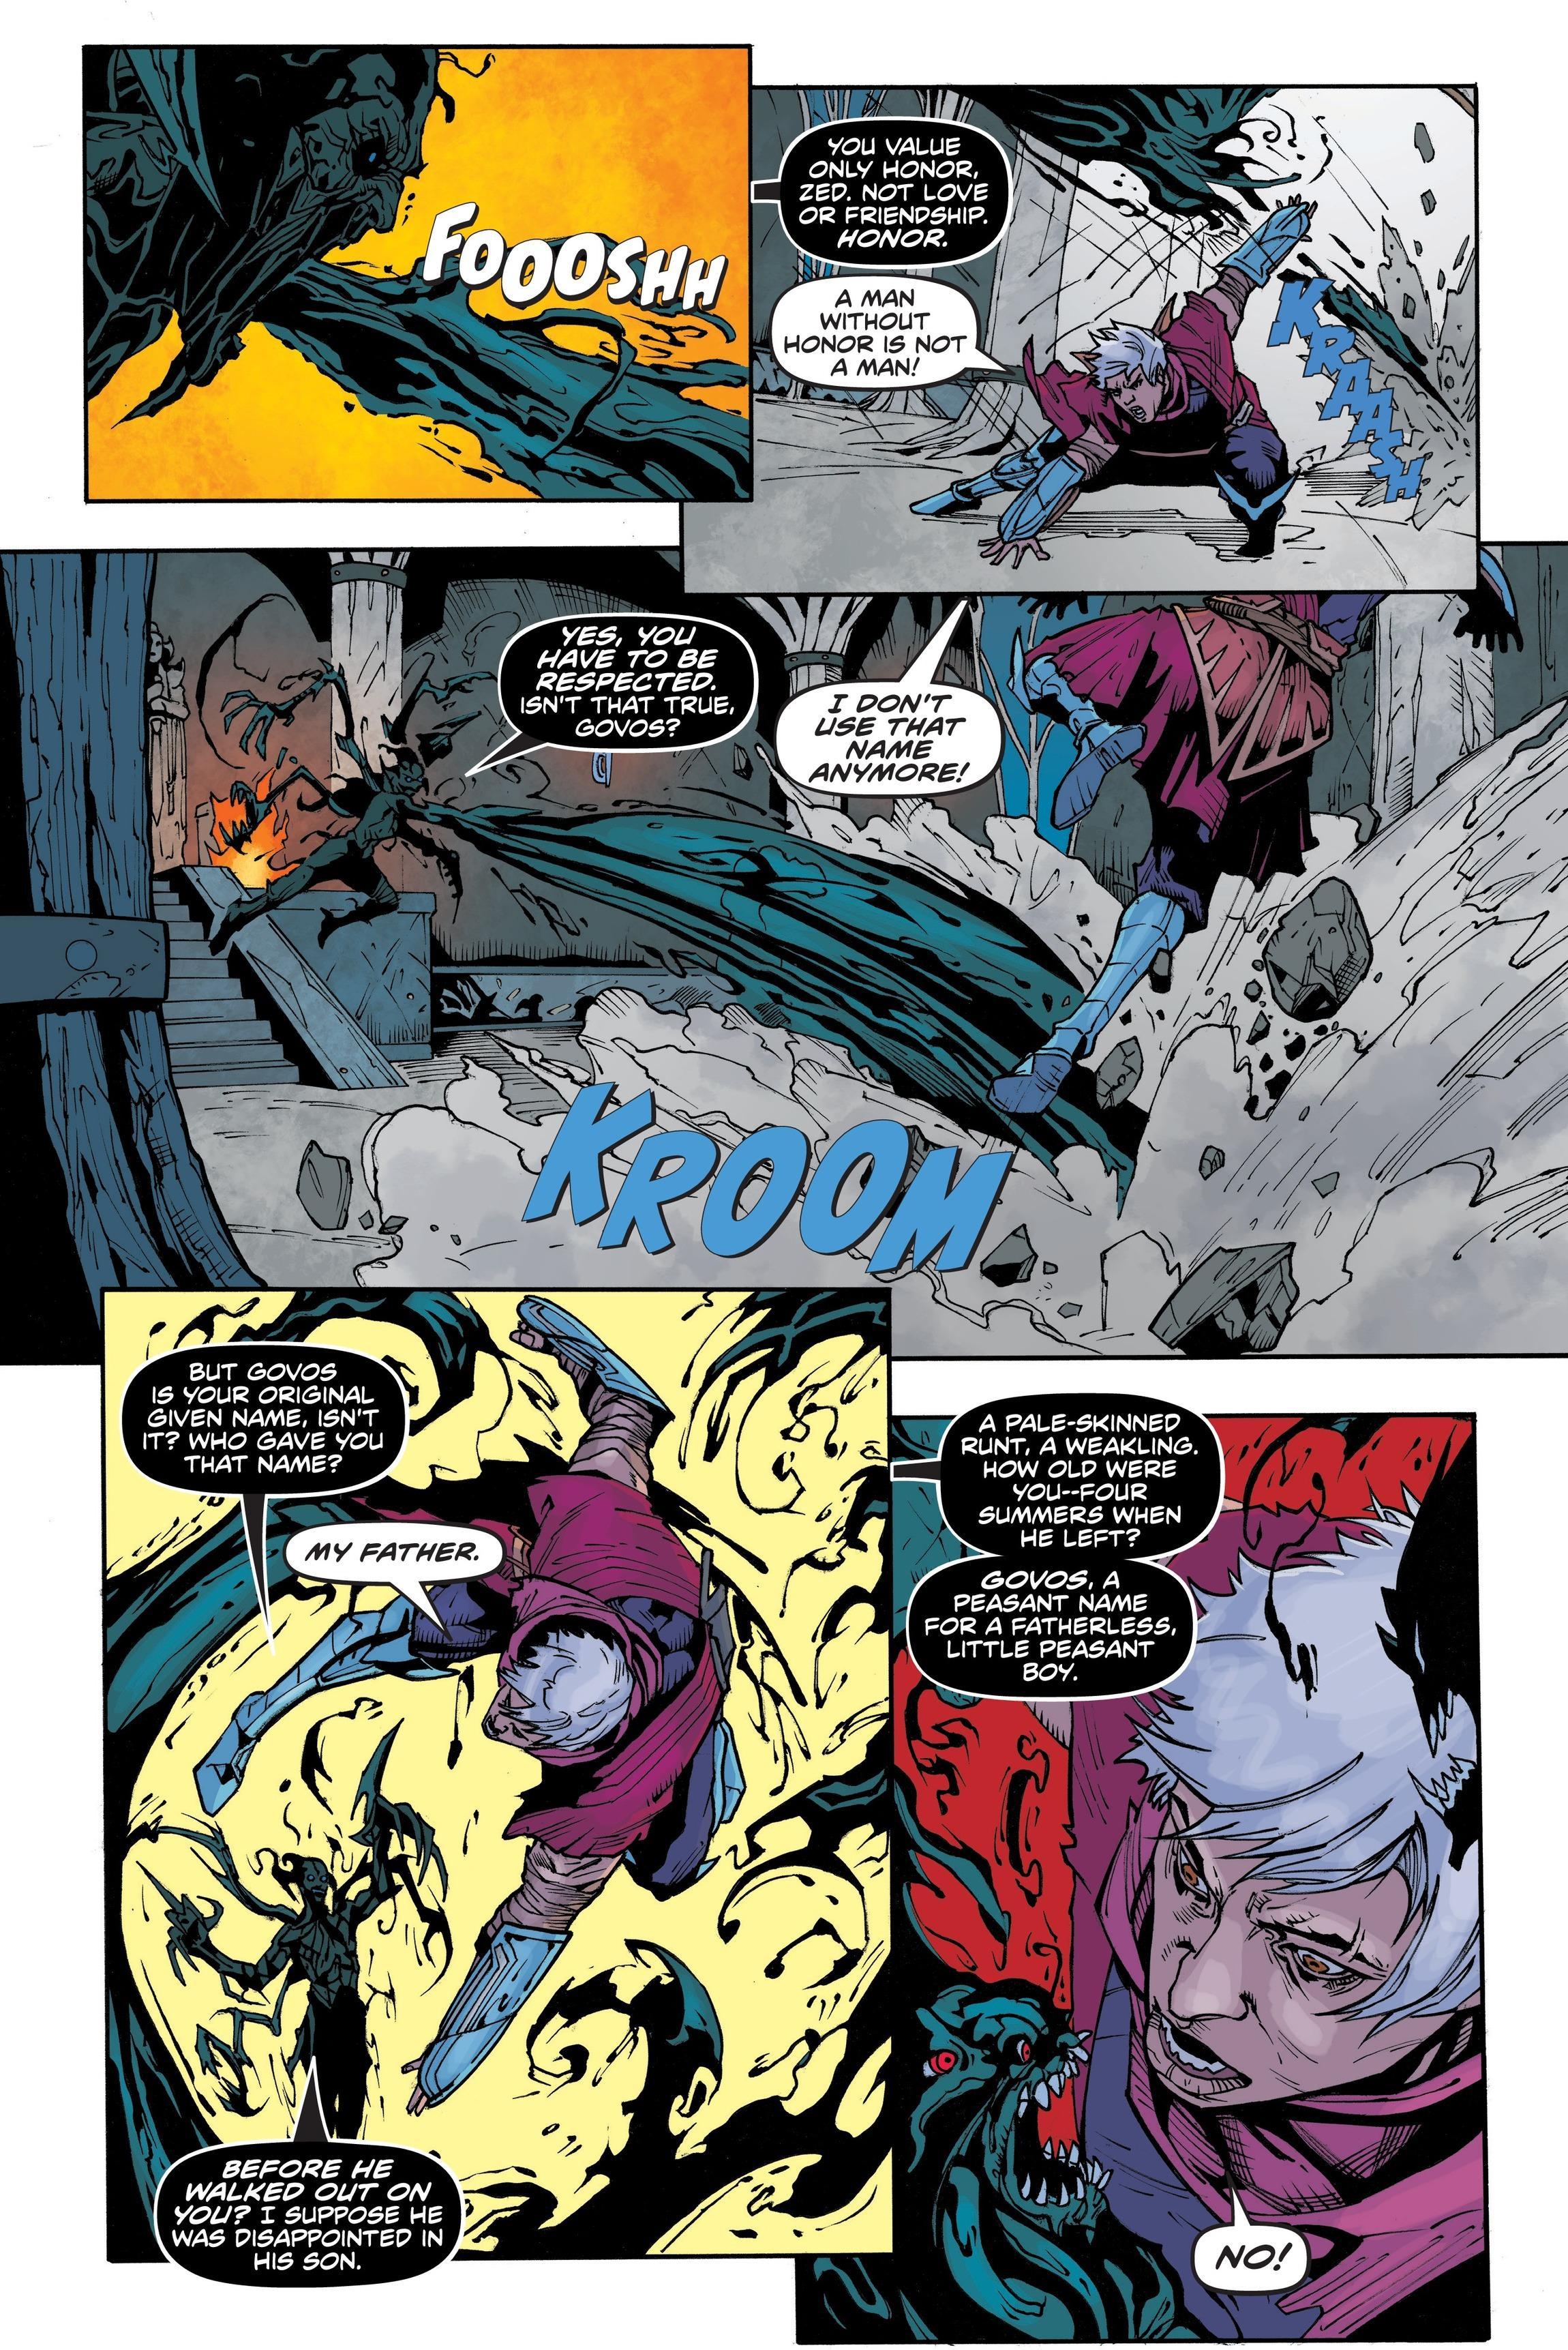 Zed Comic 6 pr18